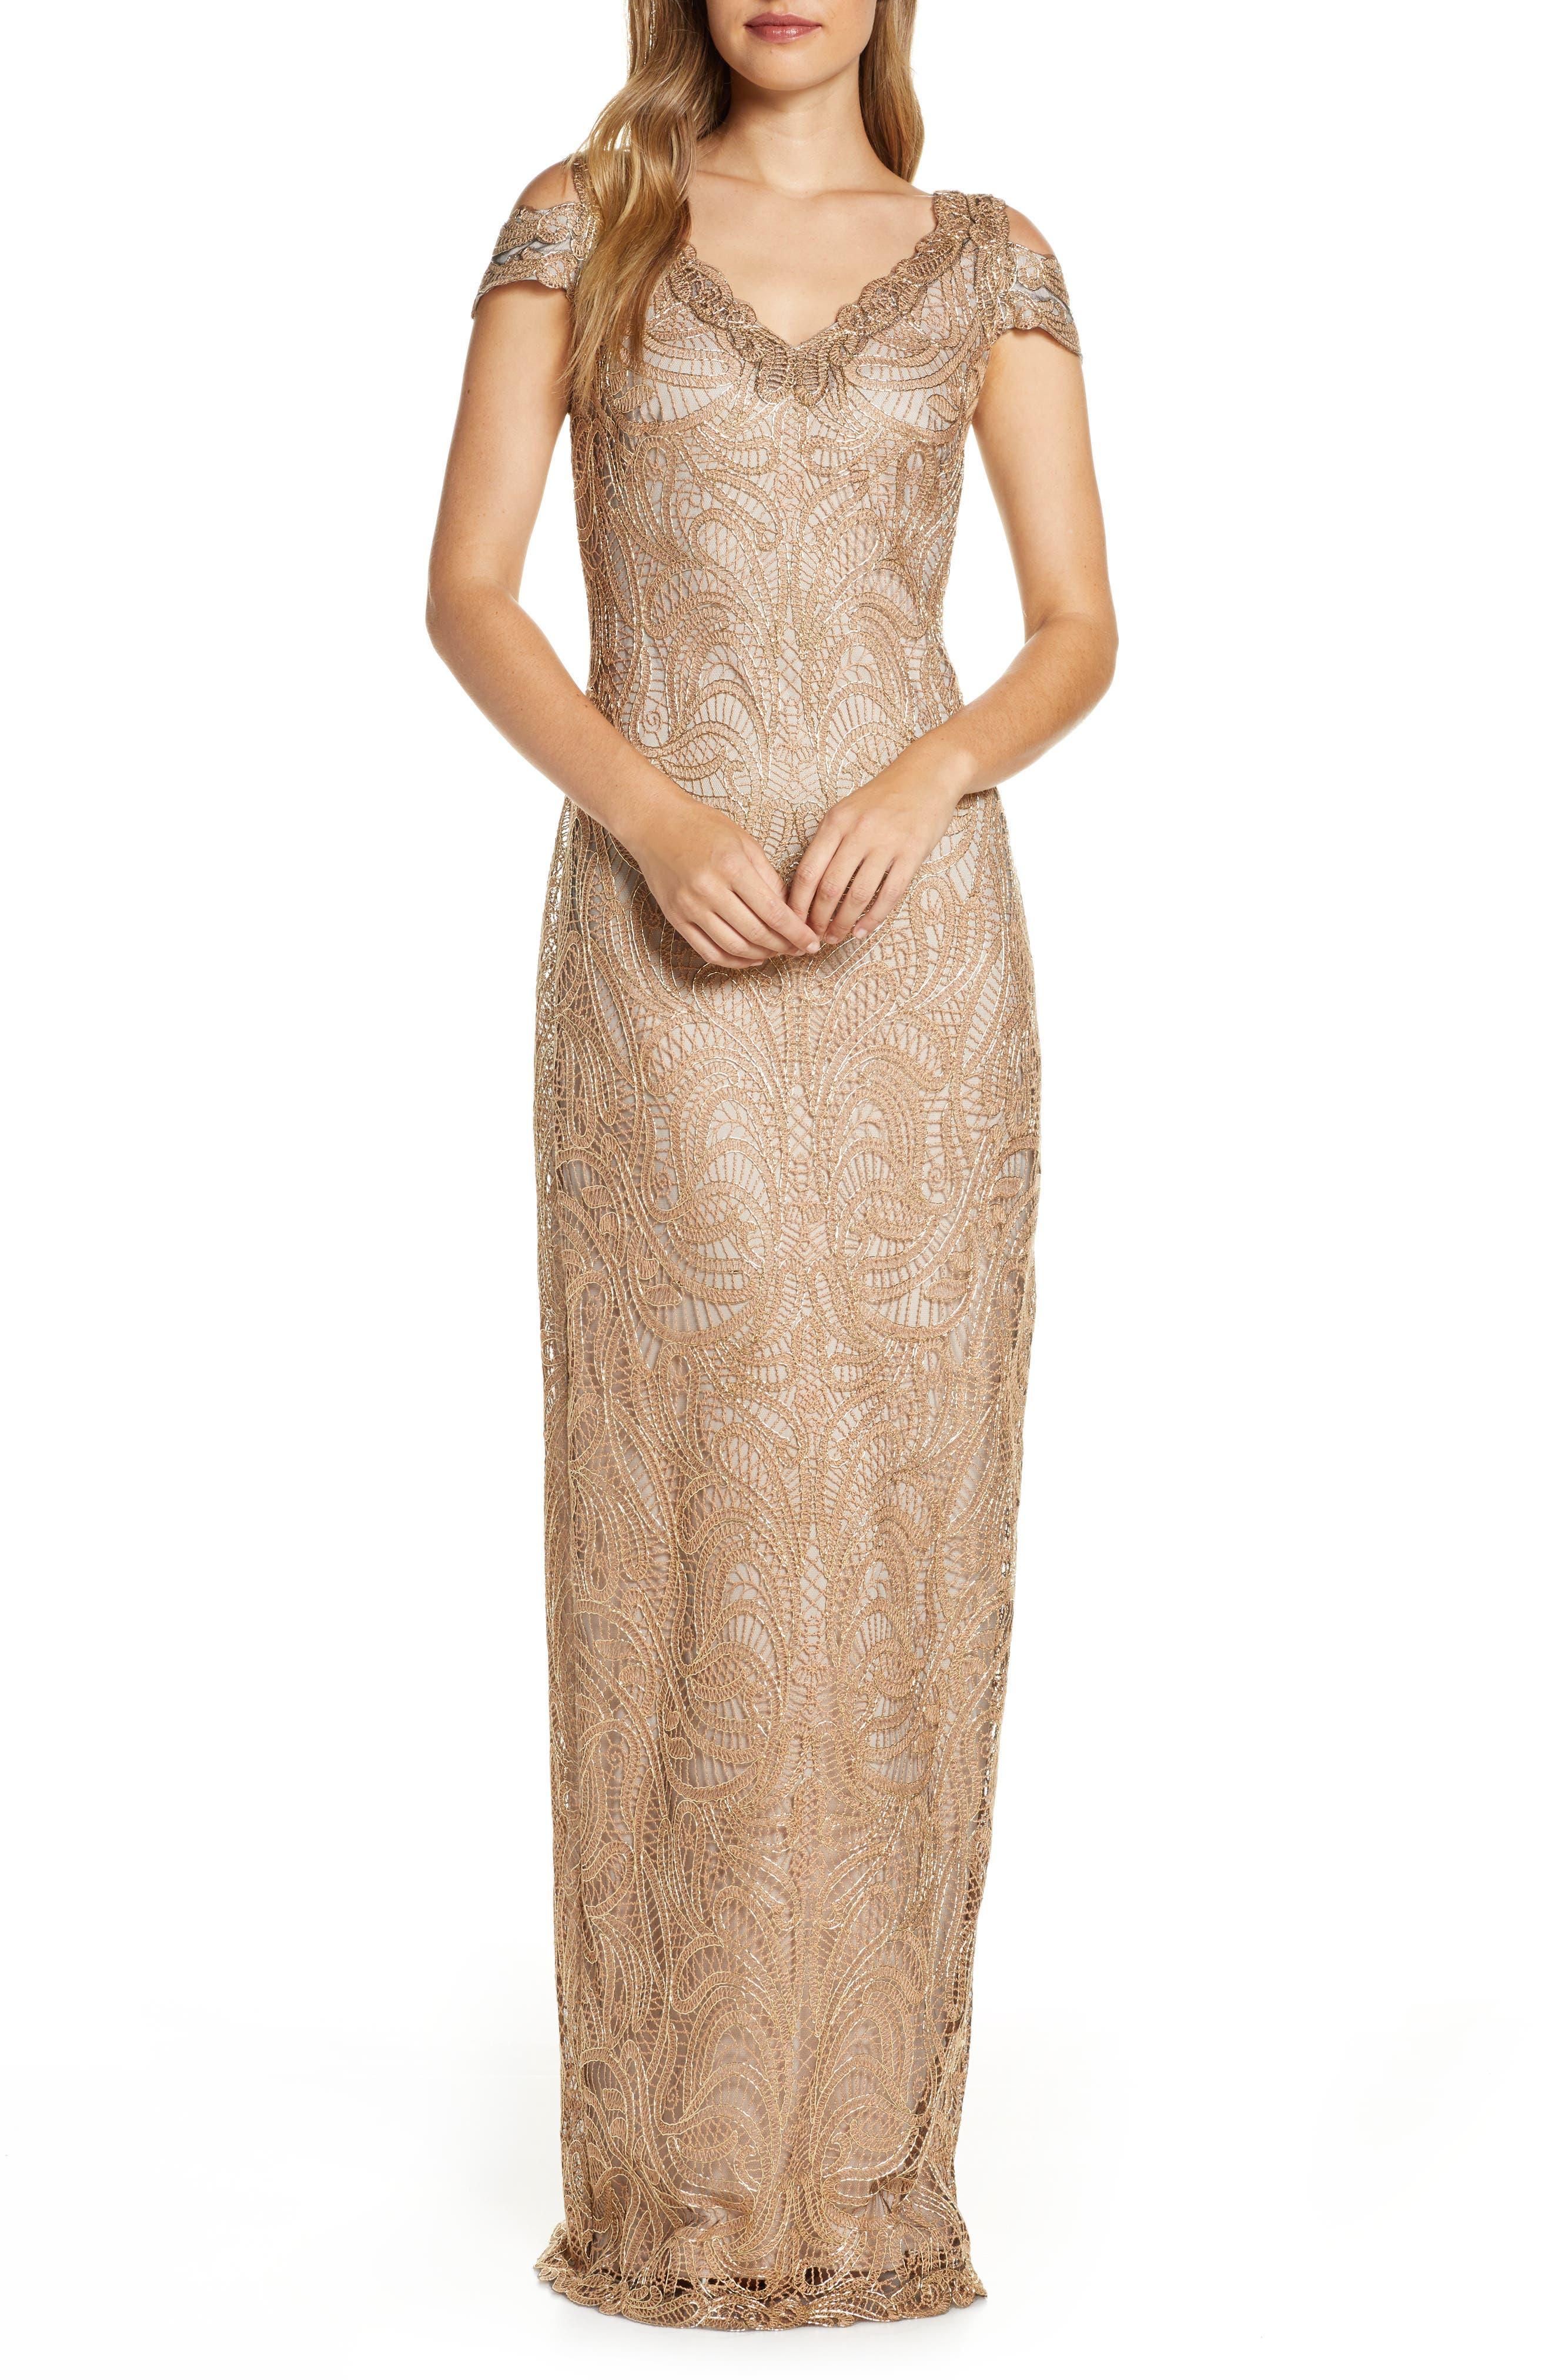 Downton Abbey Inspired Dresses Womens Tadashi Shoji Cold Shoulder Lace Column Gown $308.00 AT vintagedancer.com